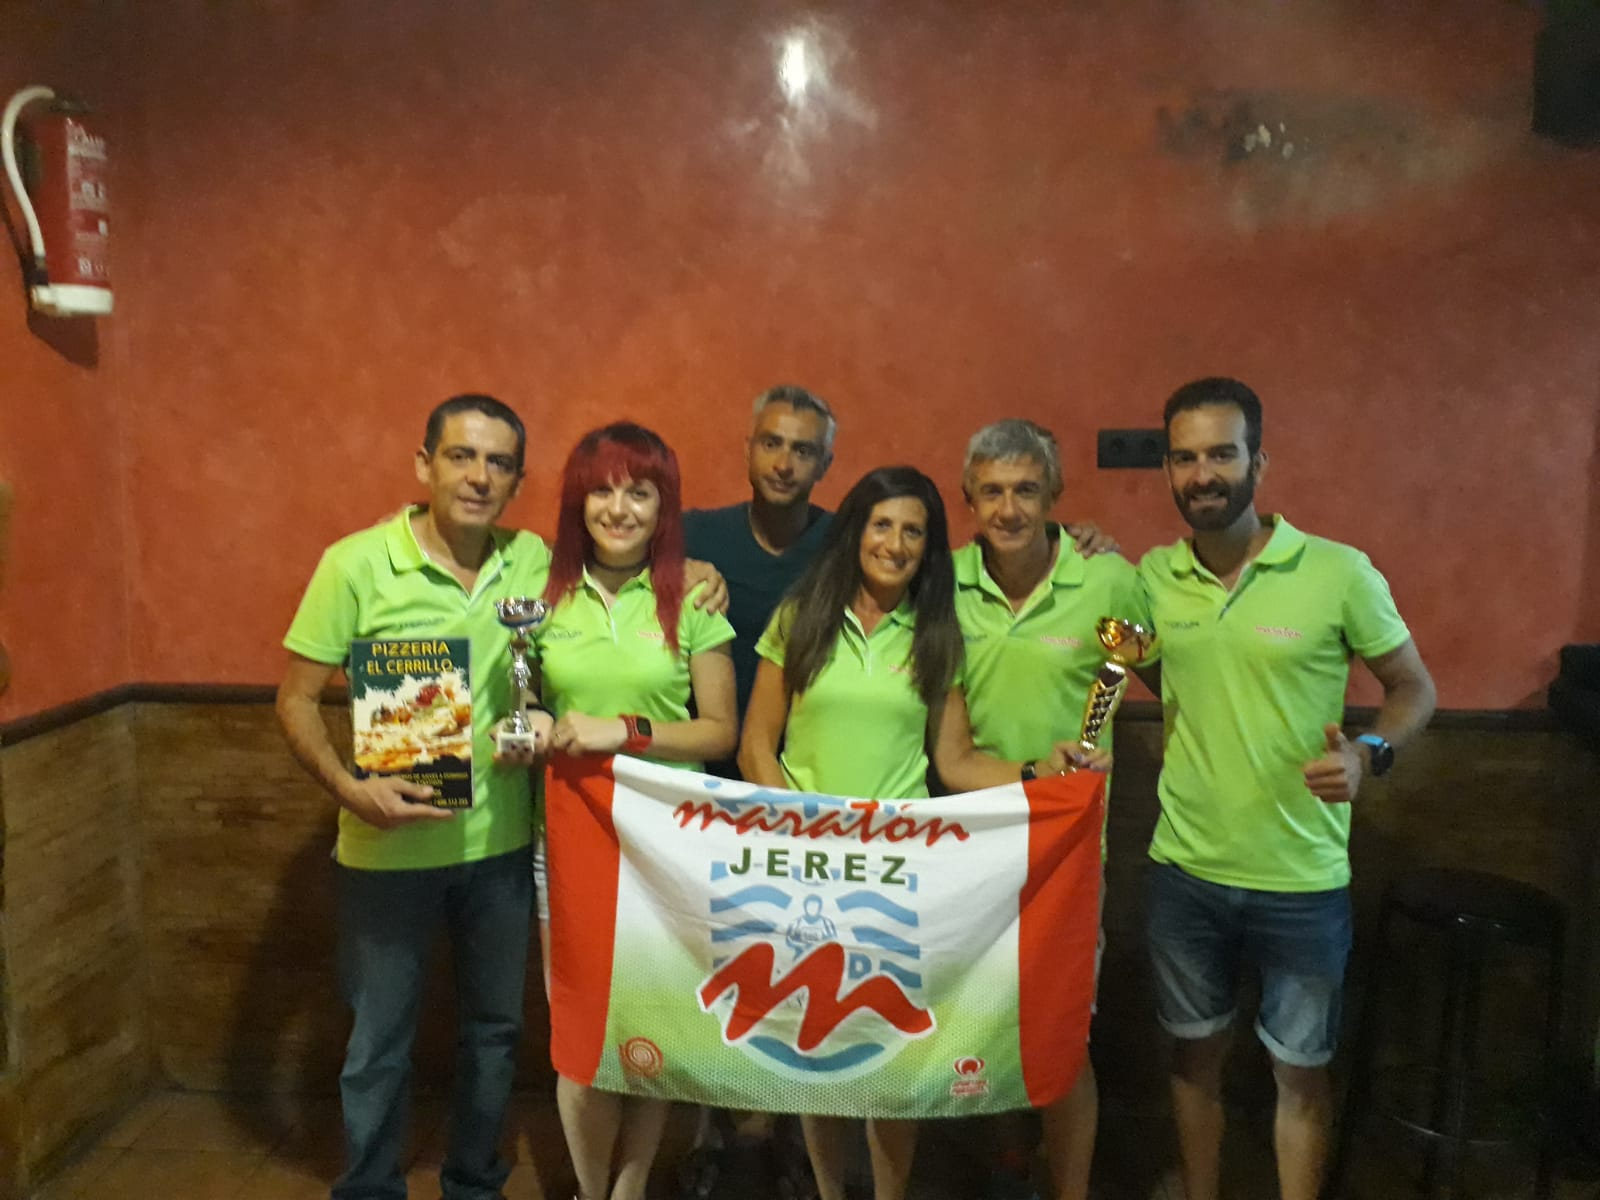 Hoy en elMira.es – Gran éxito de la AD Maratón en la Carrera Popular de Paterna-